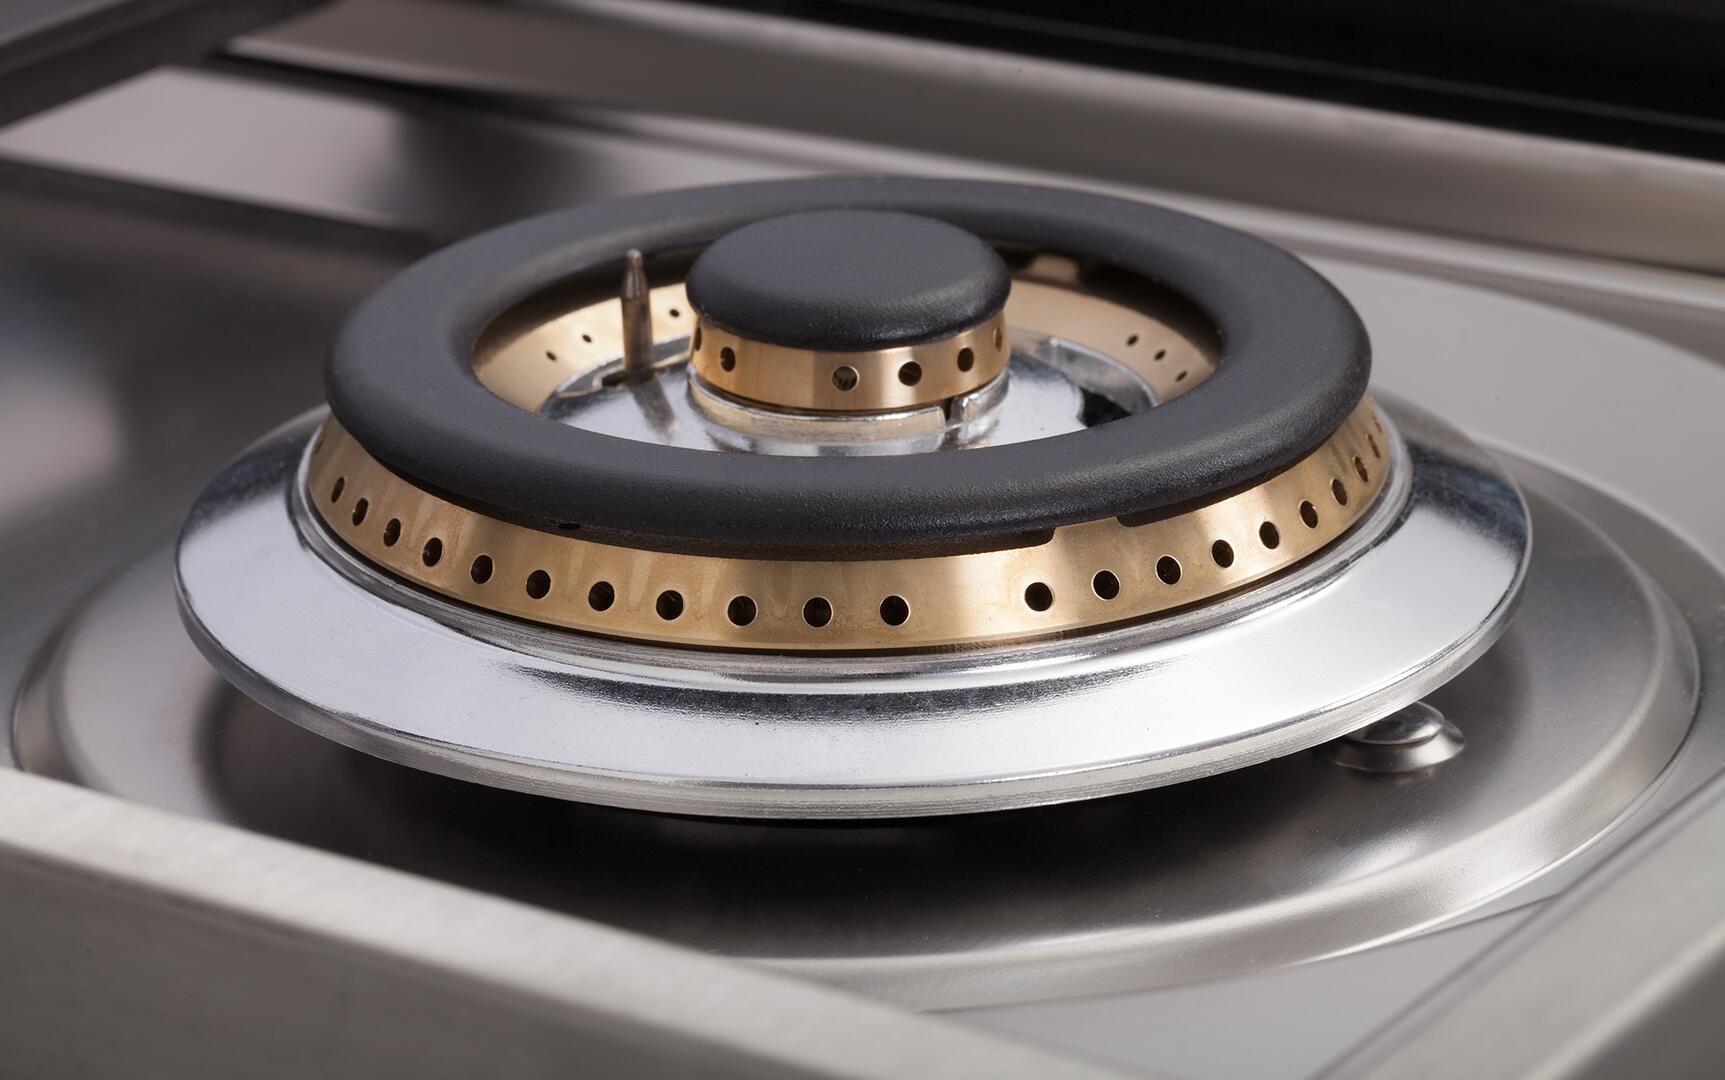 Ilve Professional Plus UPDW100FDMPB Freestanding Dual Fuel Range White, 19